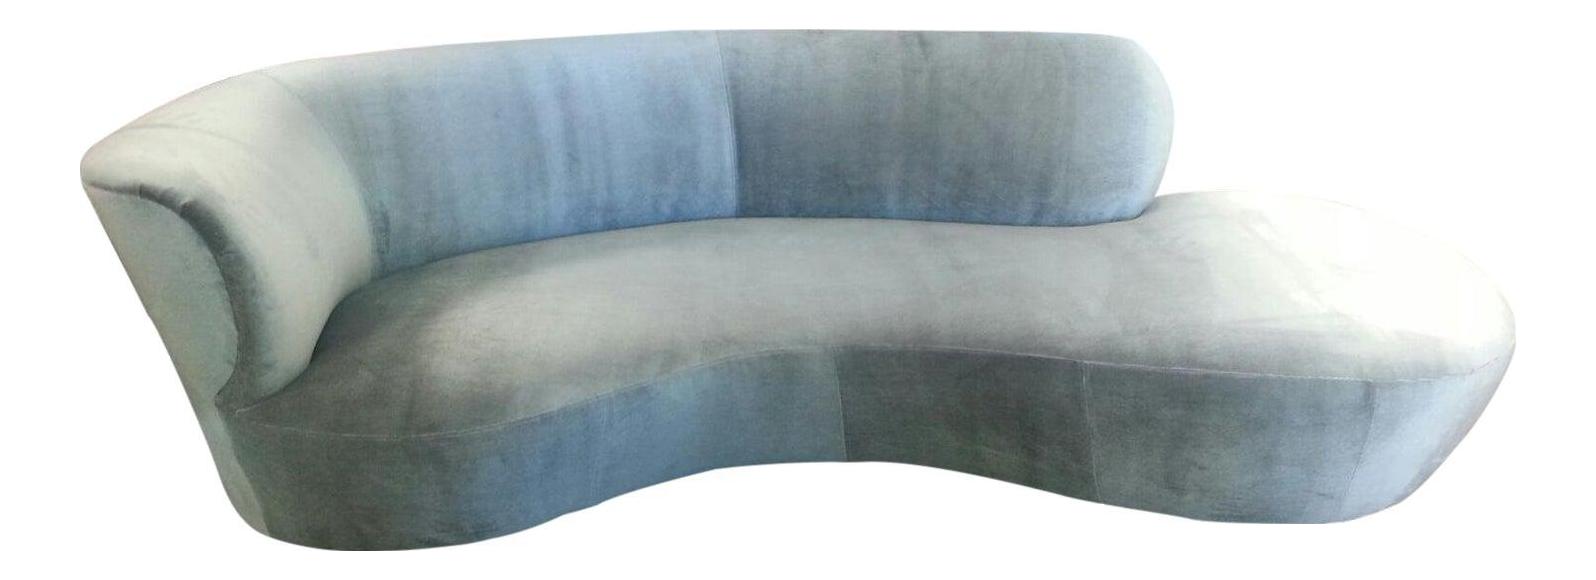 Mid Century Modern Style Chaise Lounge Chairish